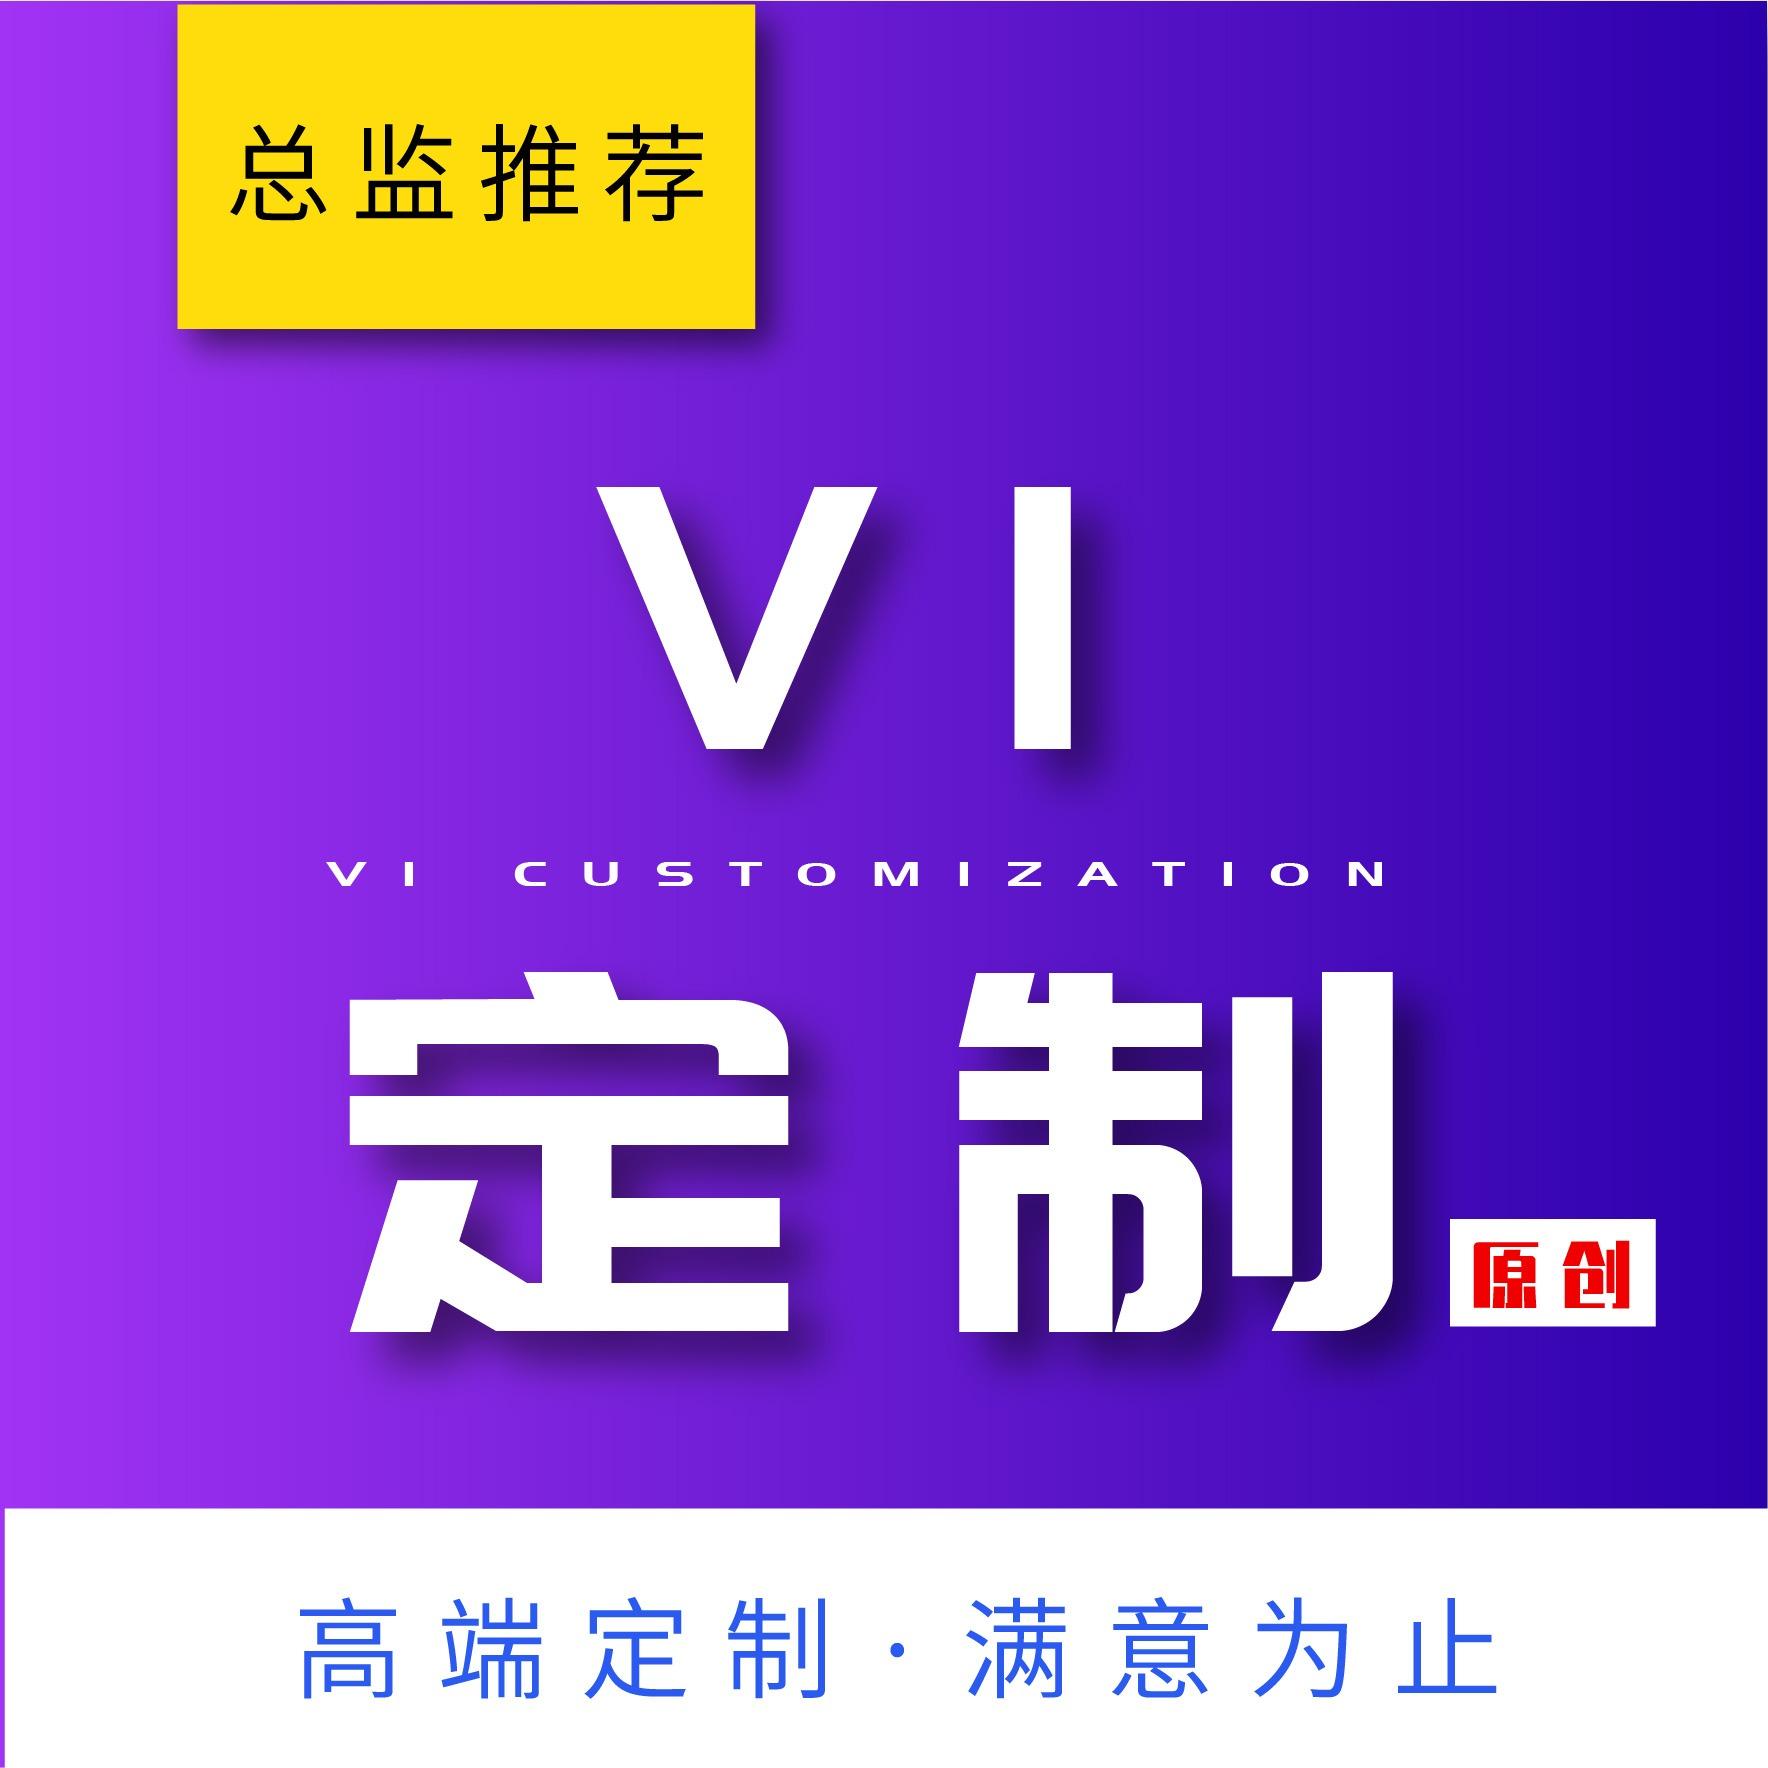 vi 导视系统ai企业 设计 服装品牌策划有限公司餐饮 vi s 设计